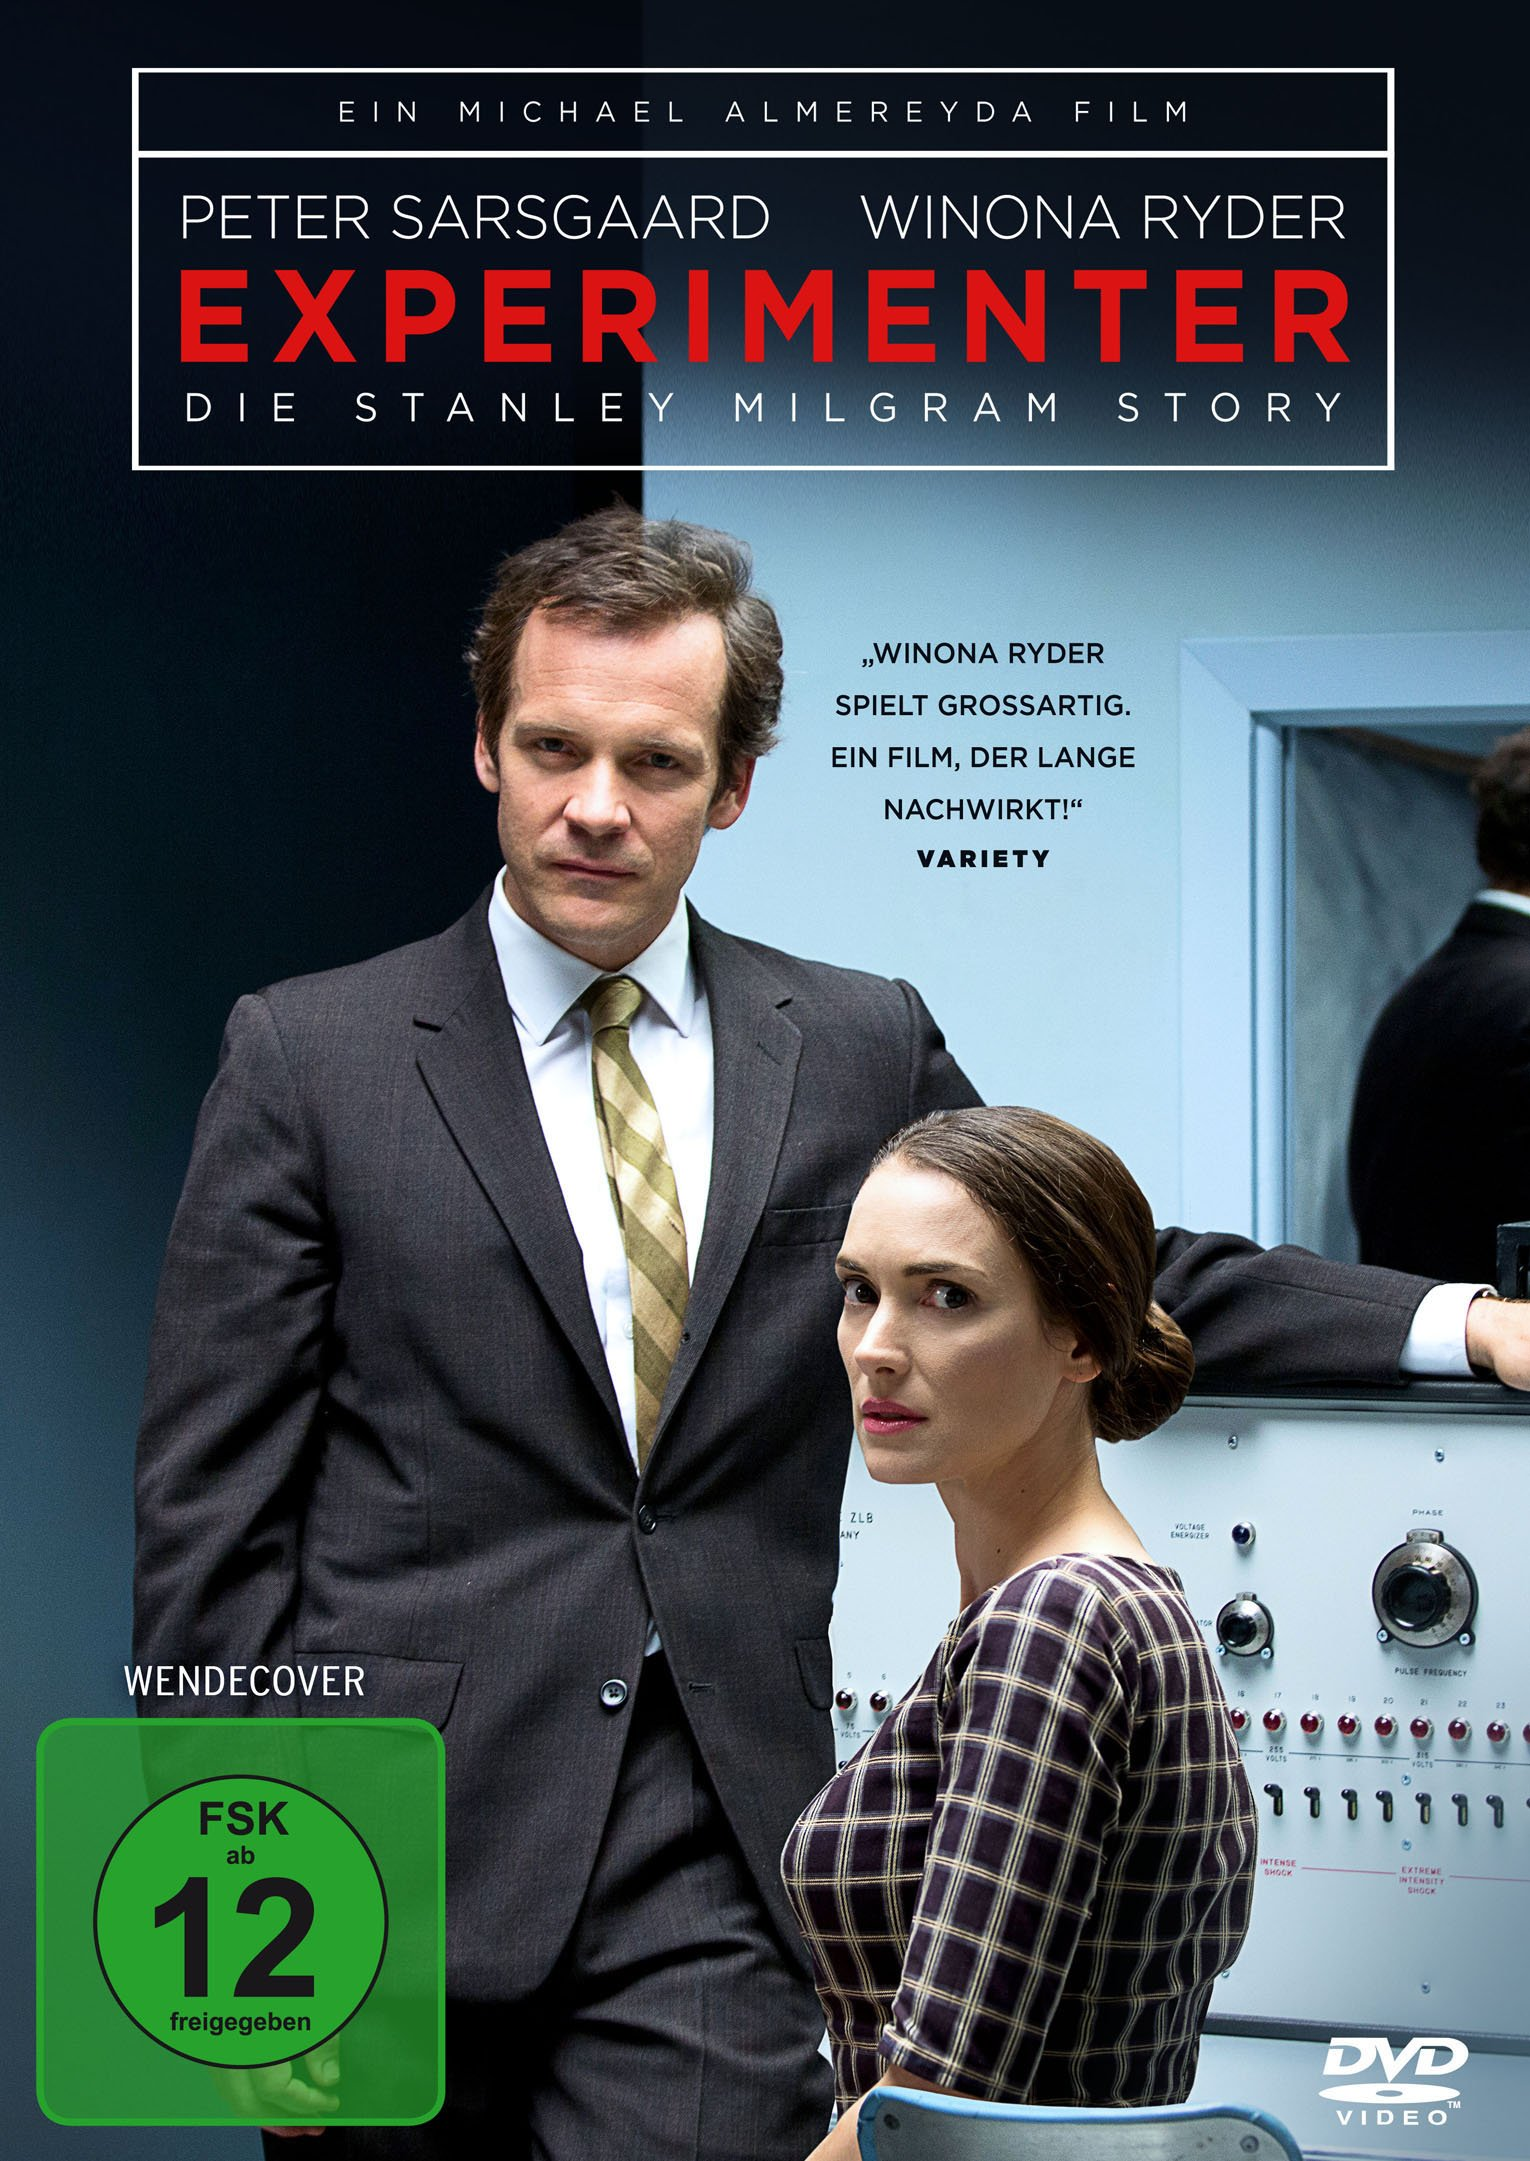 : Experimenter Die Stanley Milgram Story 2015 German 720p BluRay x264-SpiCy